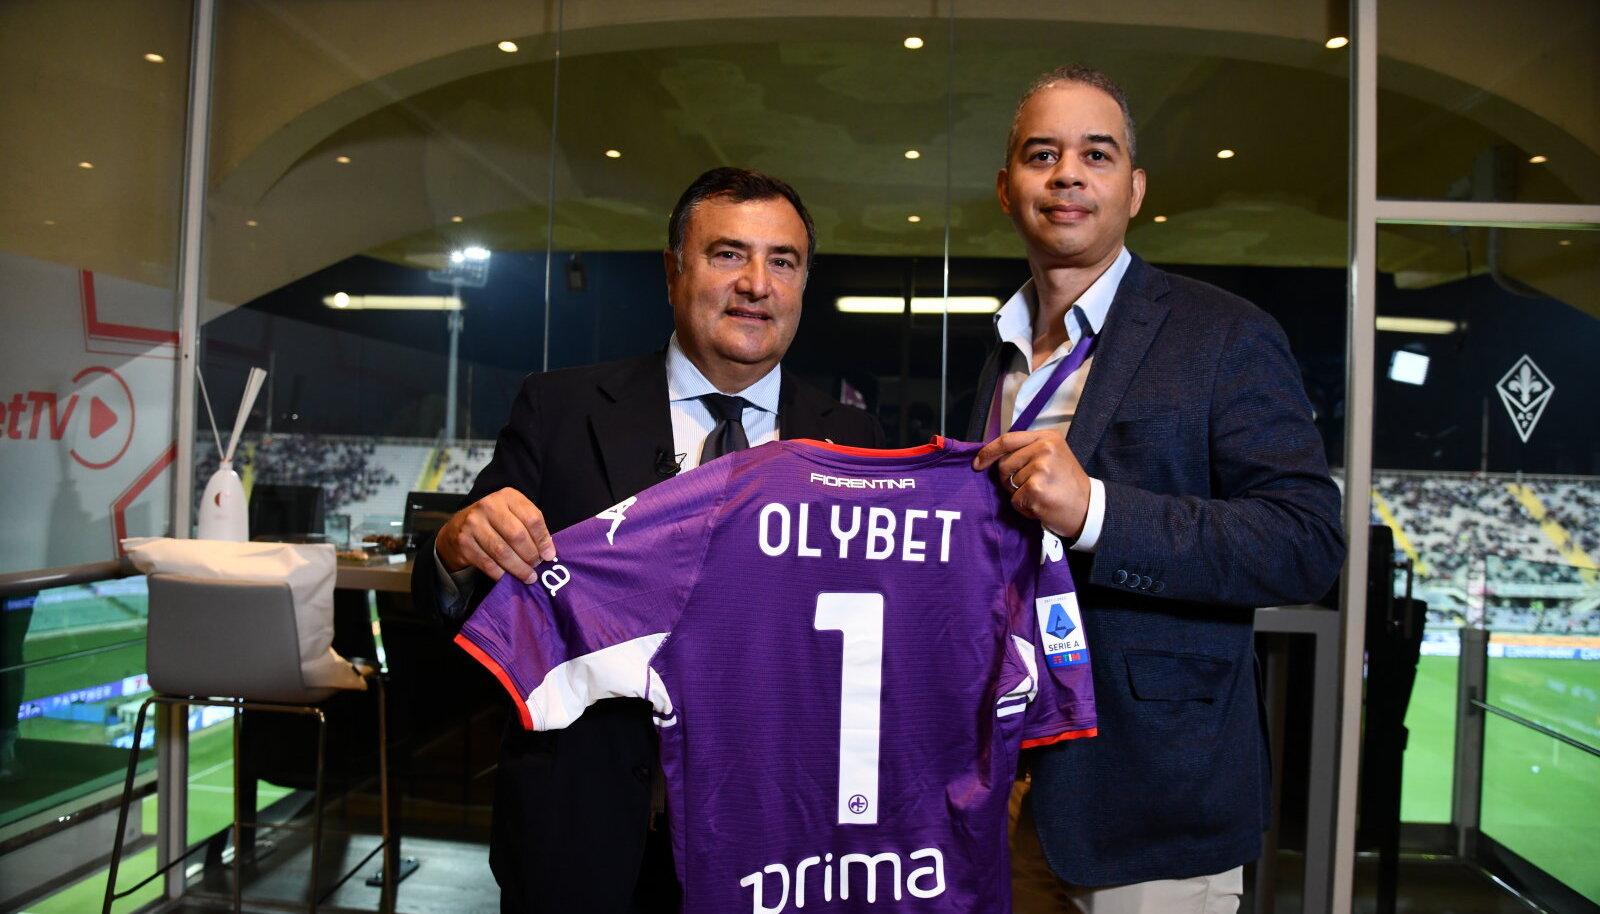 ACF Fiorentina tegevjuht Giuseppe Barone ja OlyBet Groupi juhatuse esimees Corey Plummer